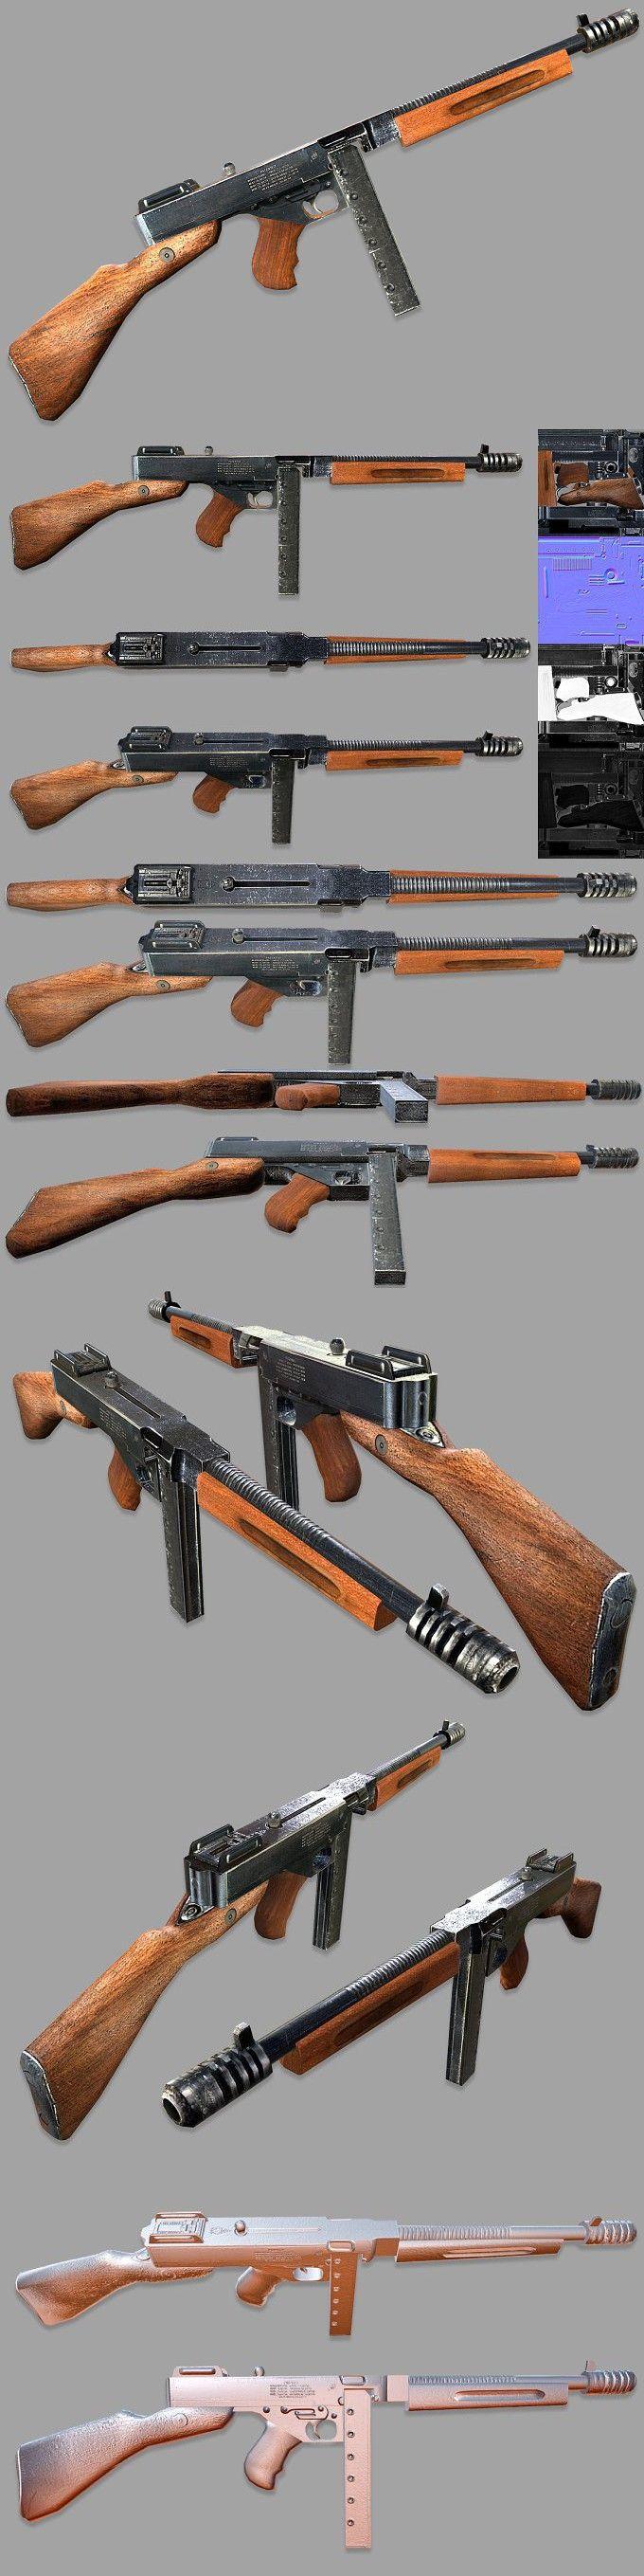 Thompson Submachine Gun. 3D Objects